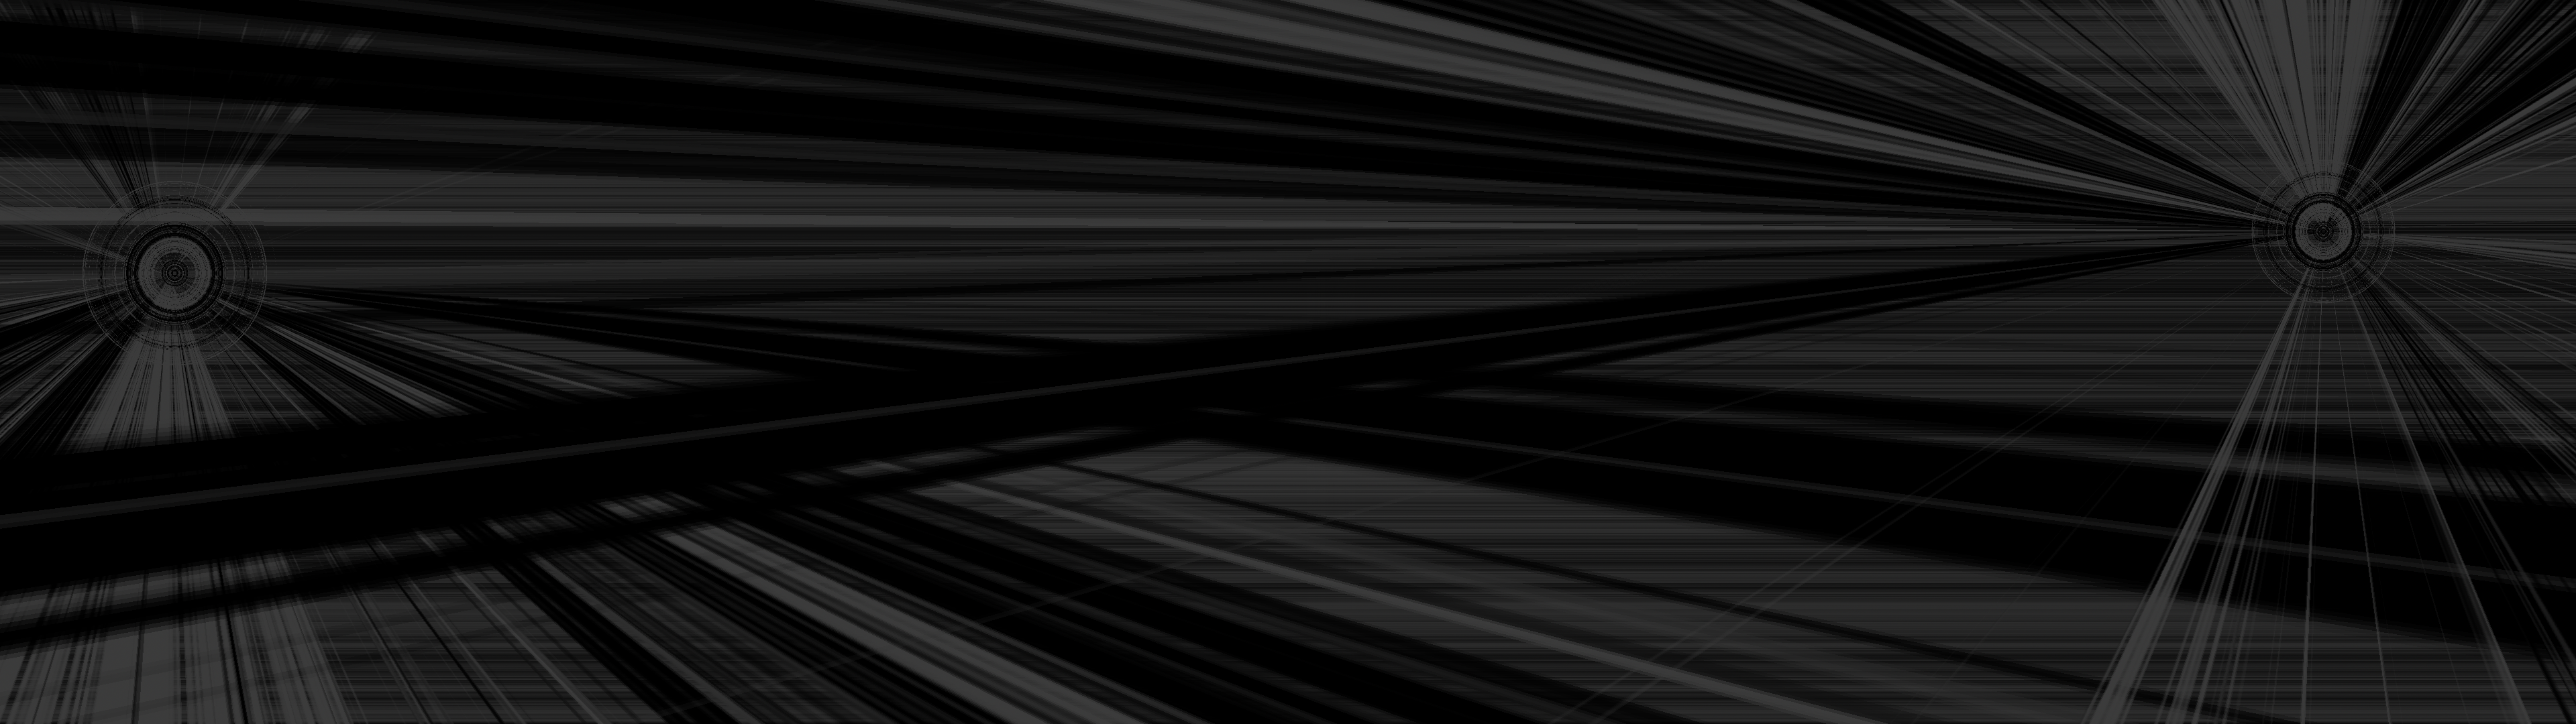 Dual Screen Background